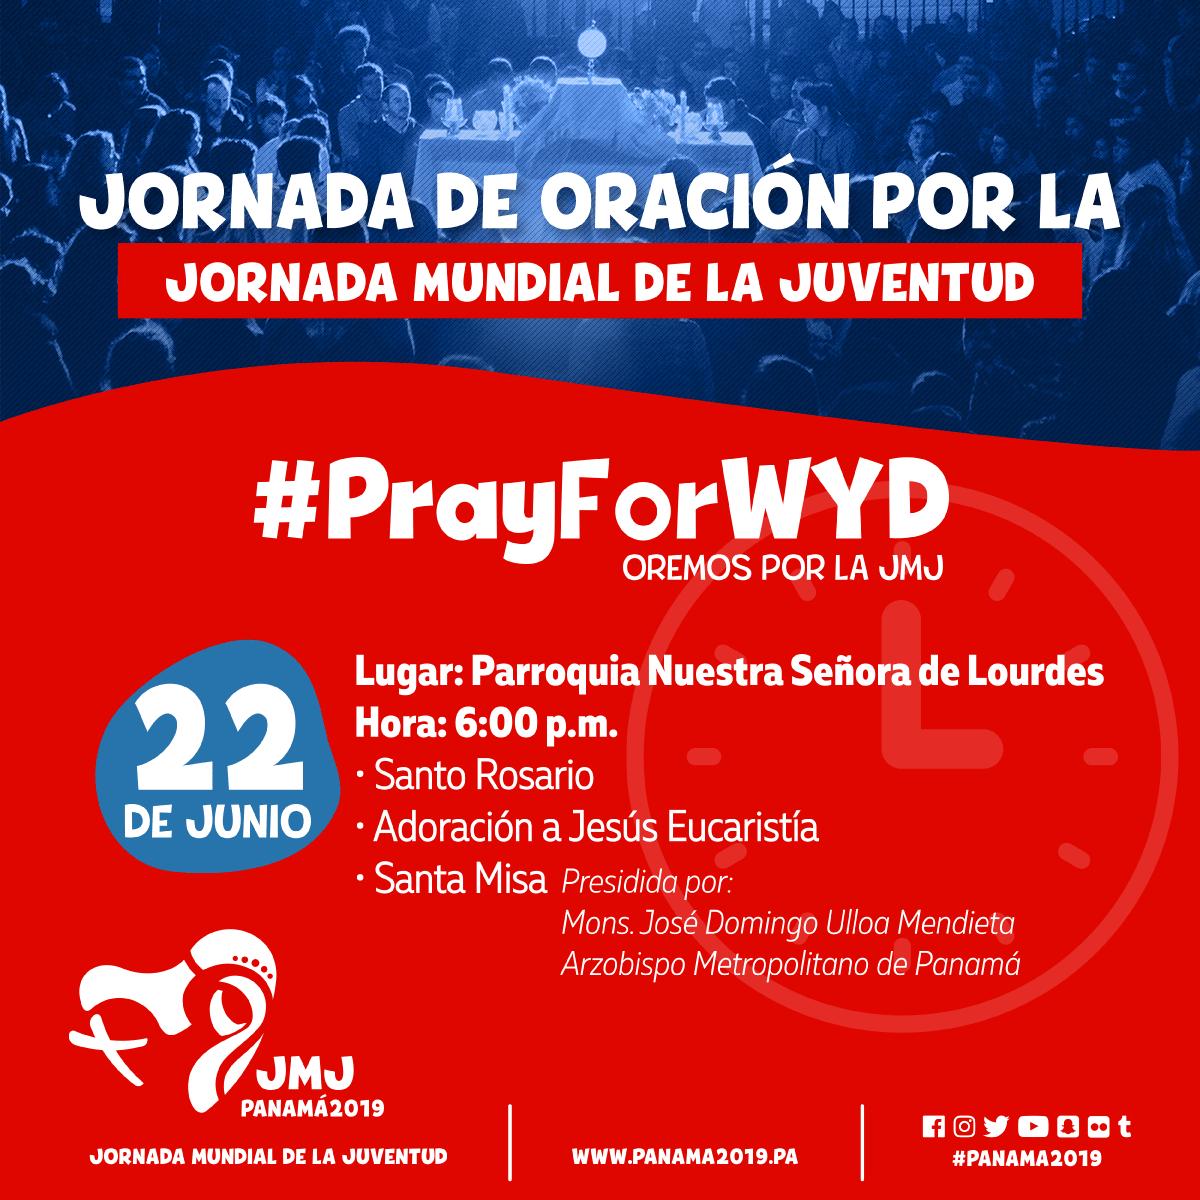 Jornada de oración por la JMJ 2019 #PrayForWYD